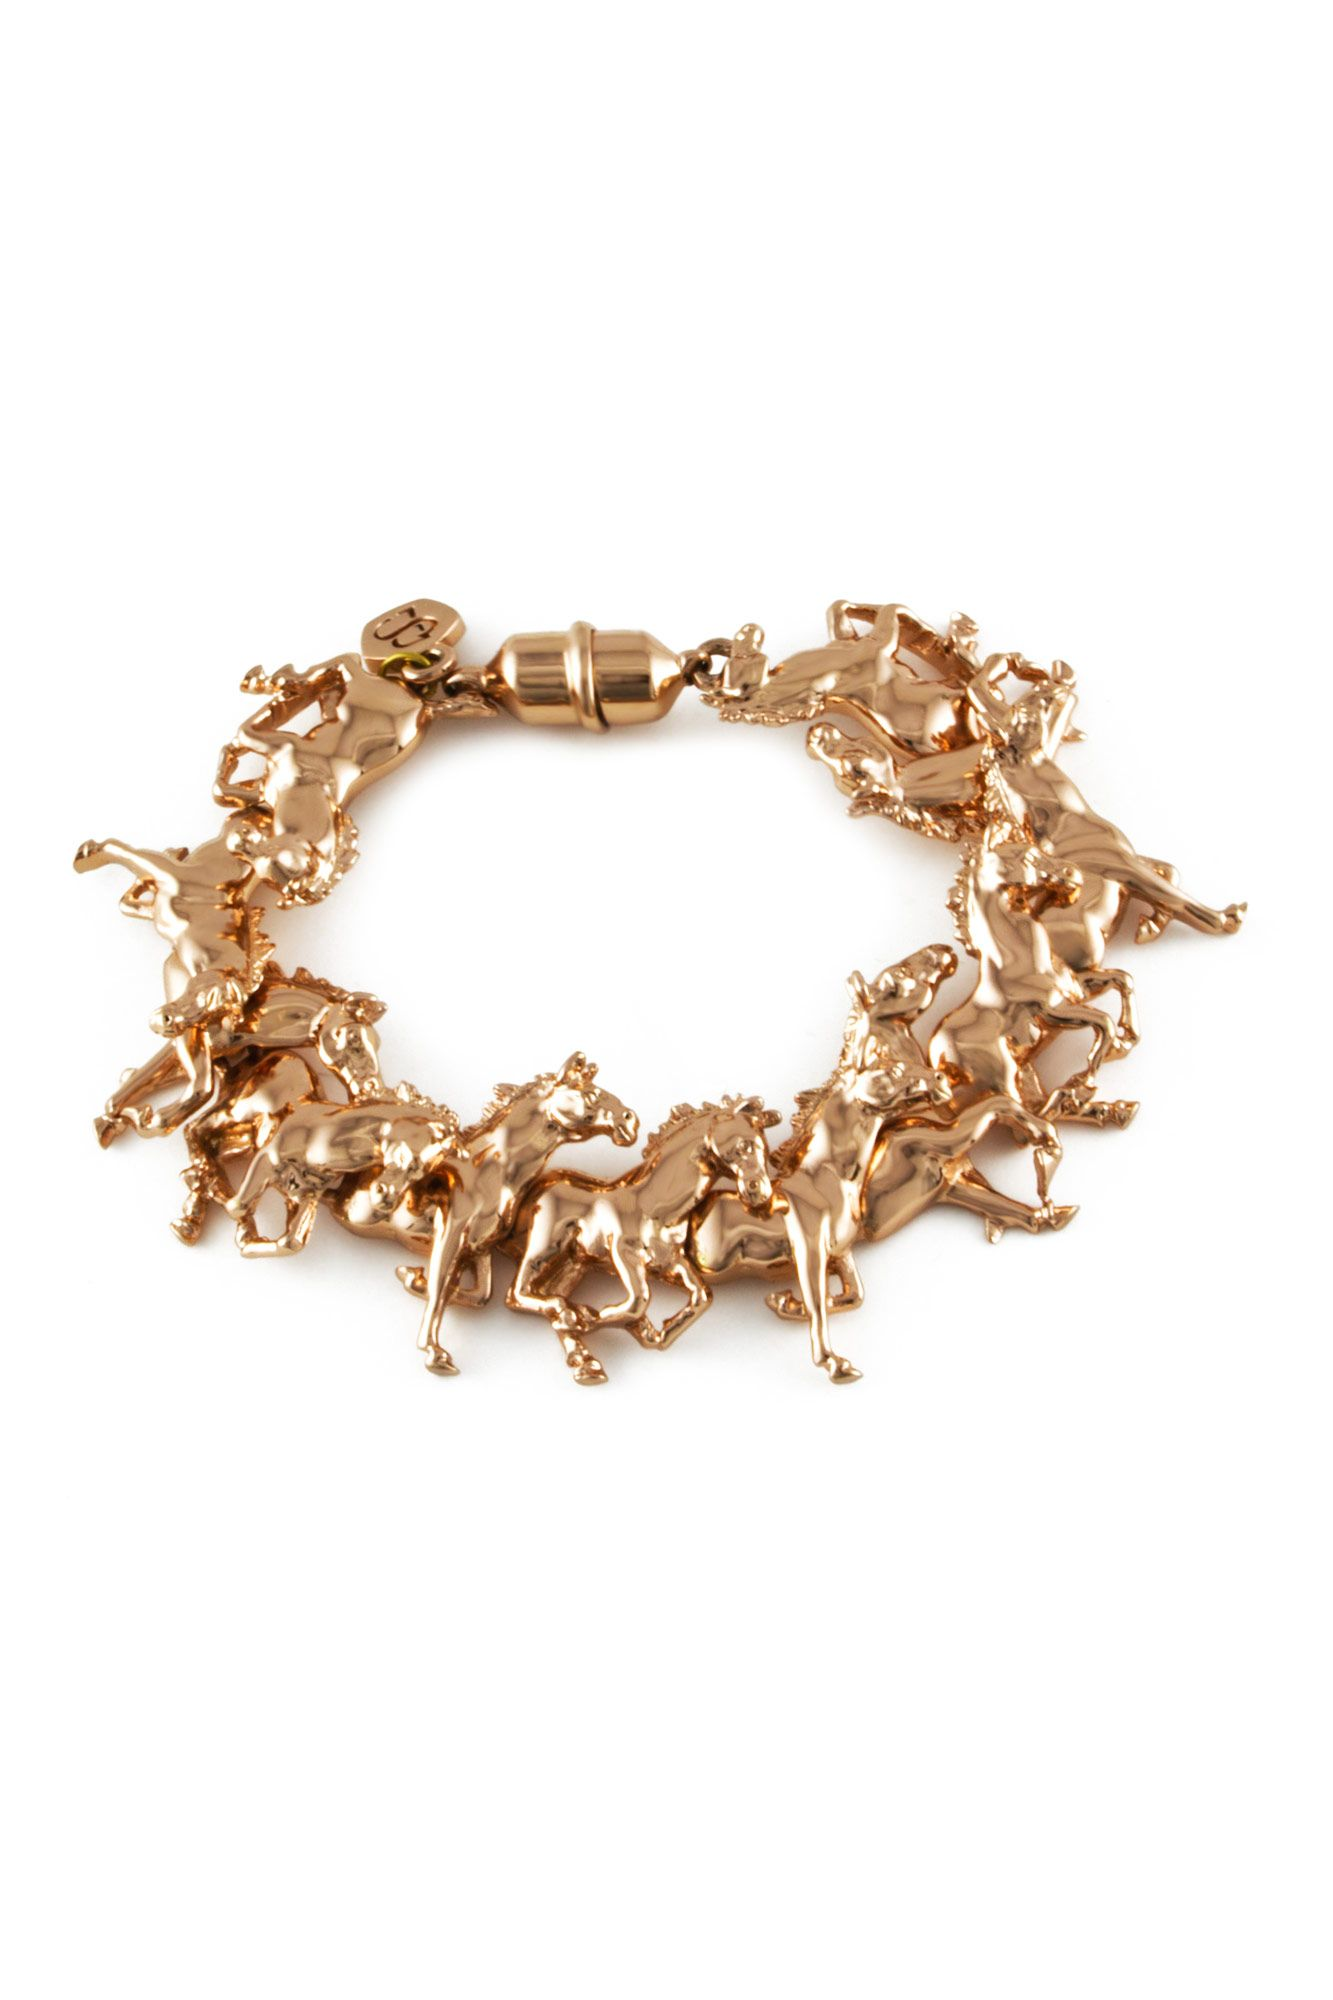 rose gold horse bracelet accessory pinterest horse